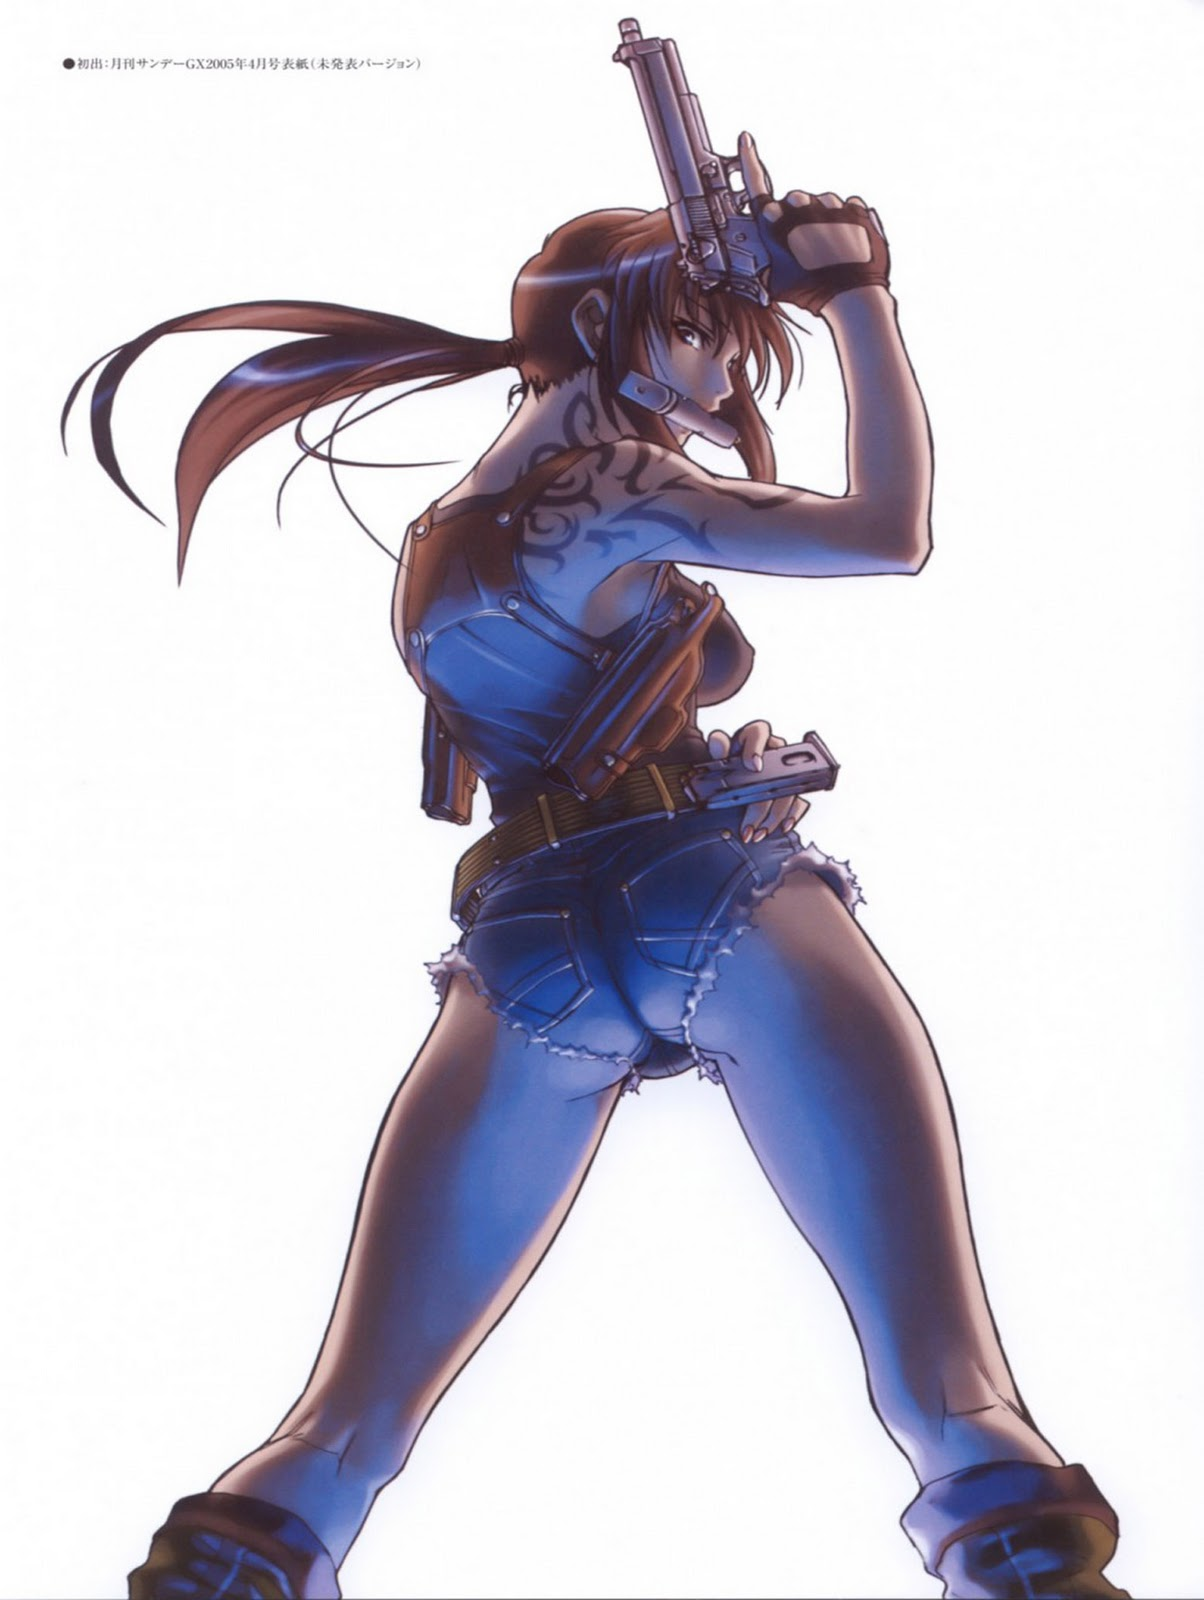 big booty anime - photo #8